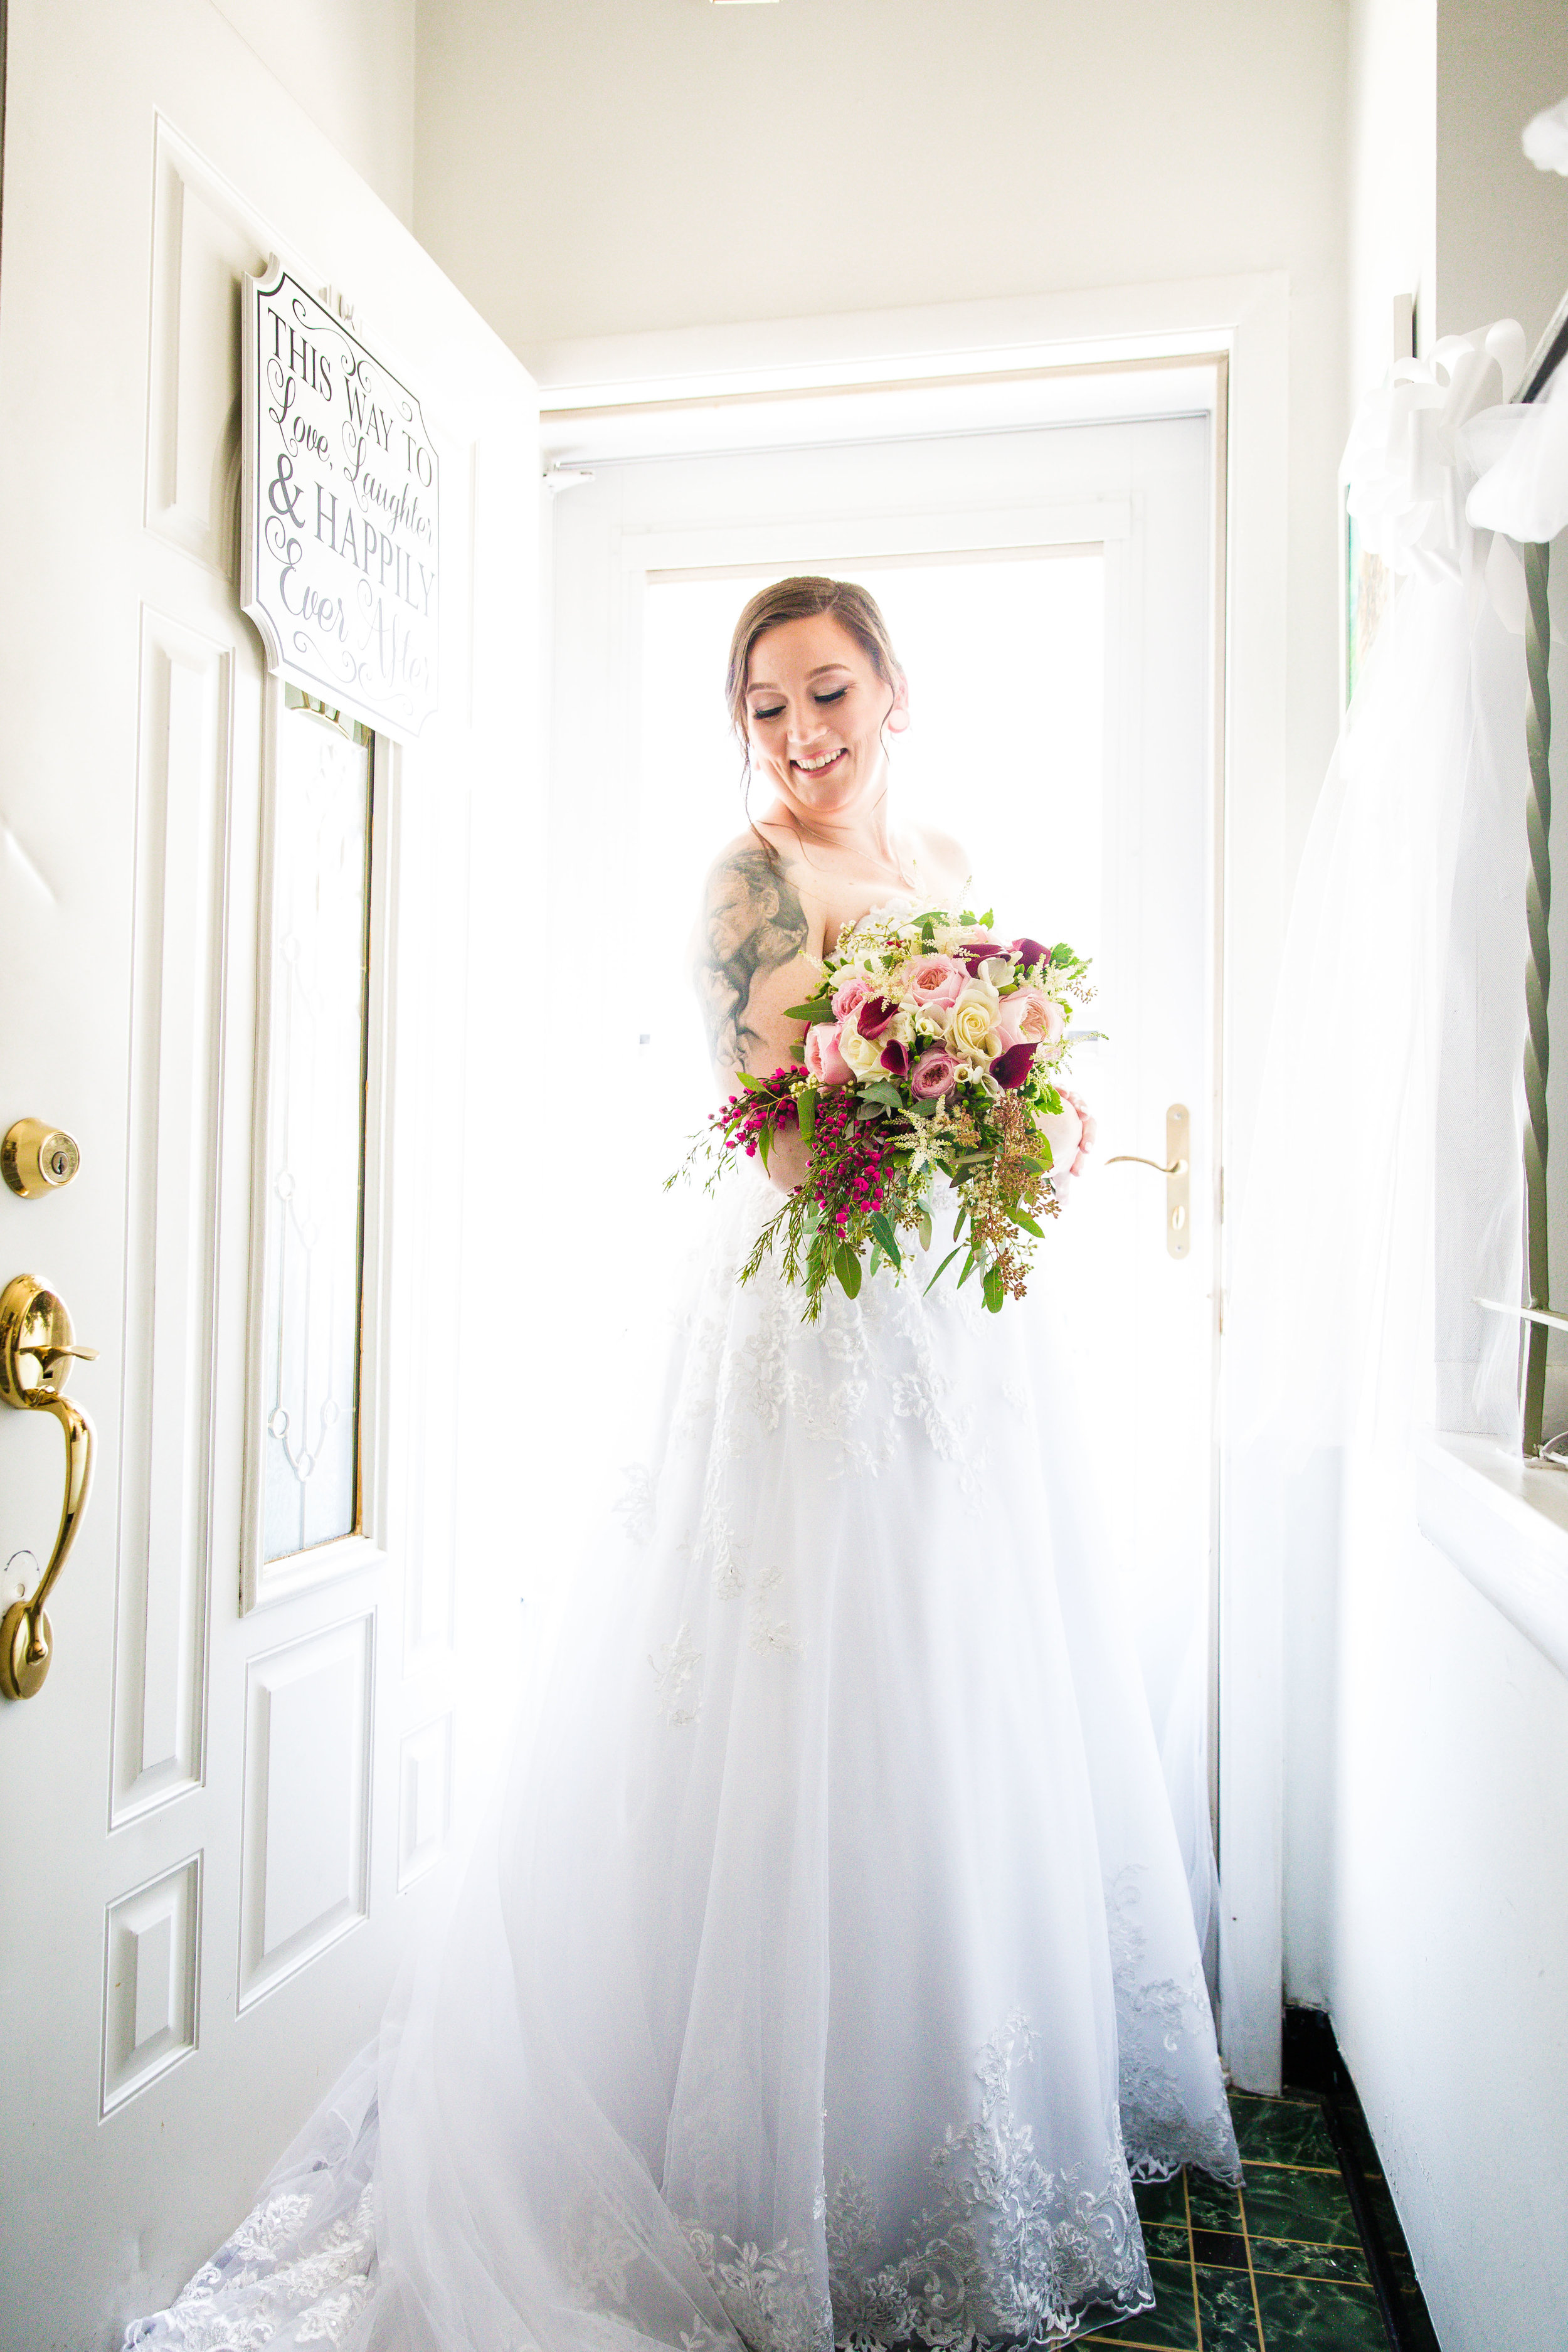 KRISTINA AND SHAWN - WATERFALL ROOM WEDDING - PHILADELPHIA-26.jpg